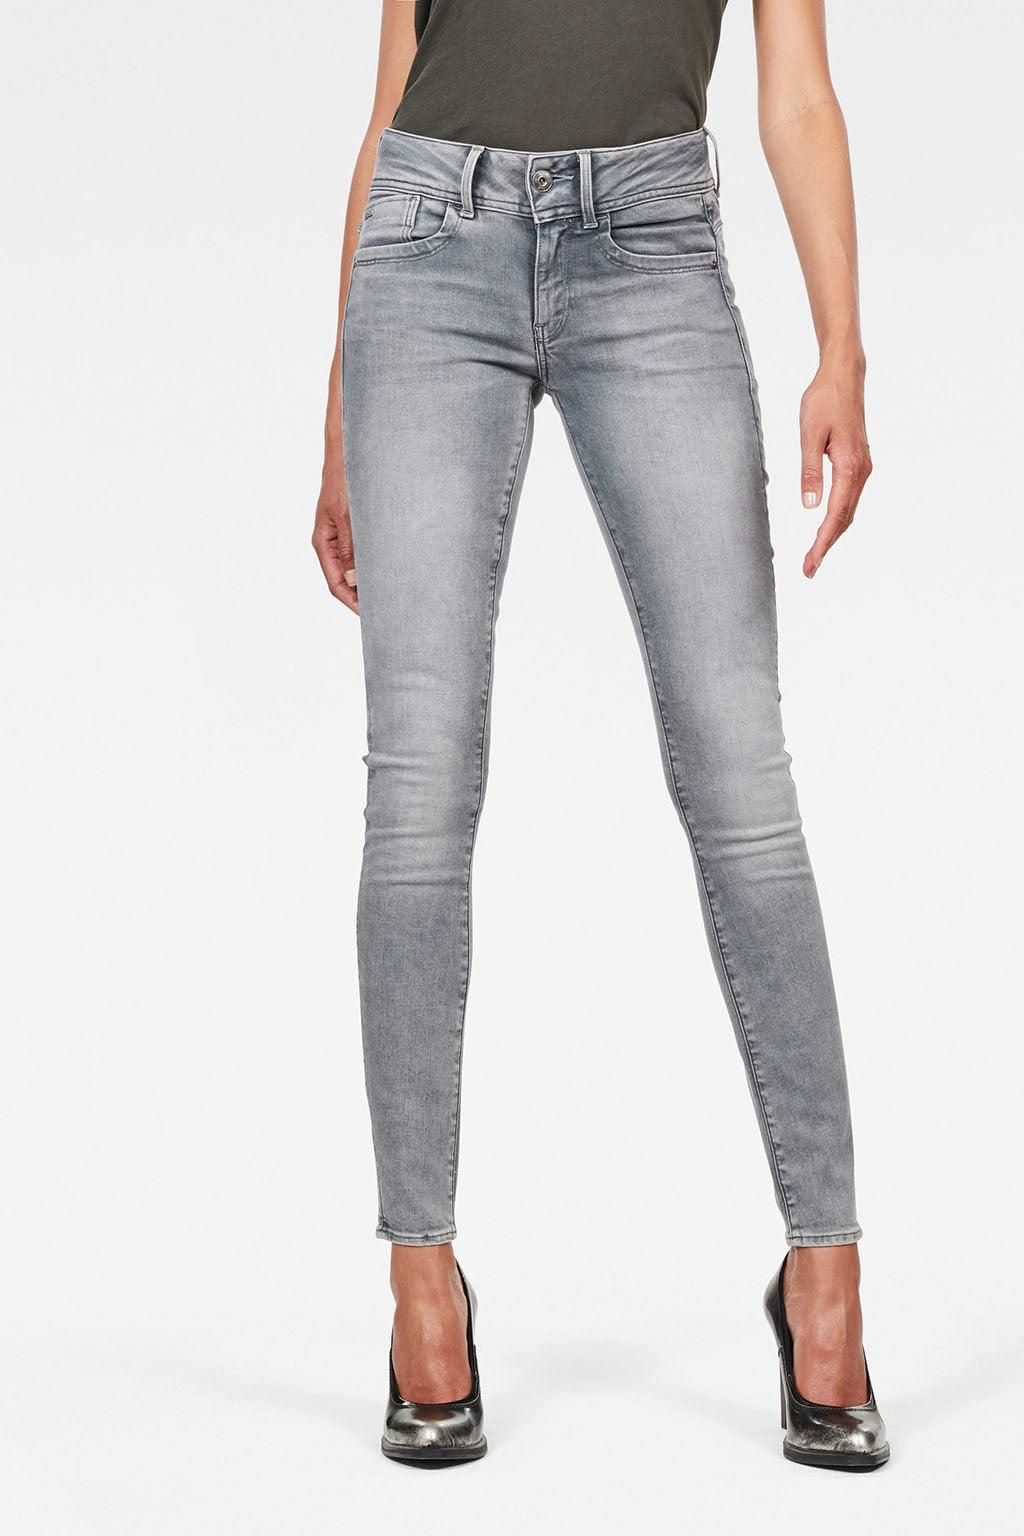 G Star Raw dames jeans | Vandaag Besteld. Morgen in Huis.